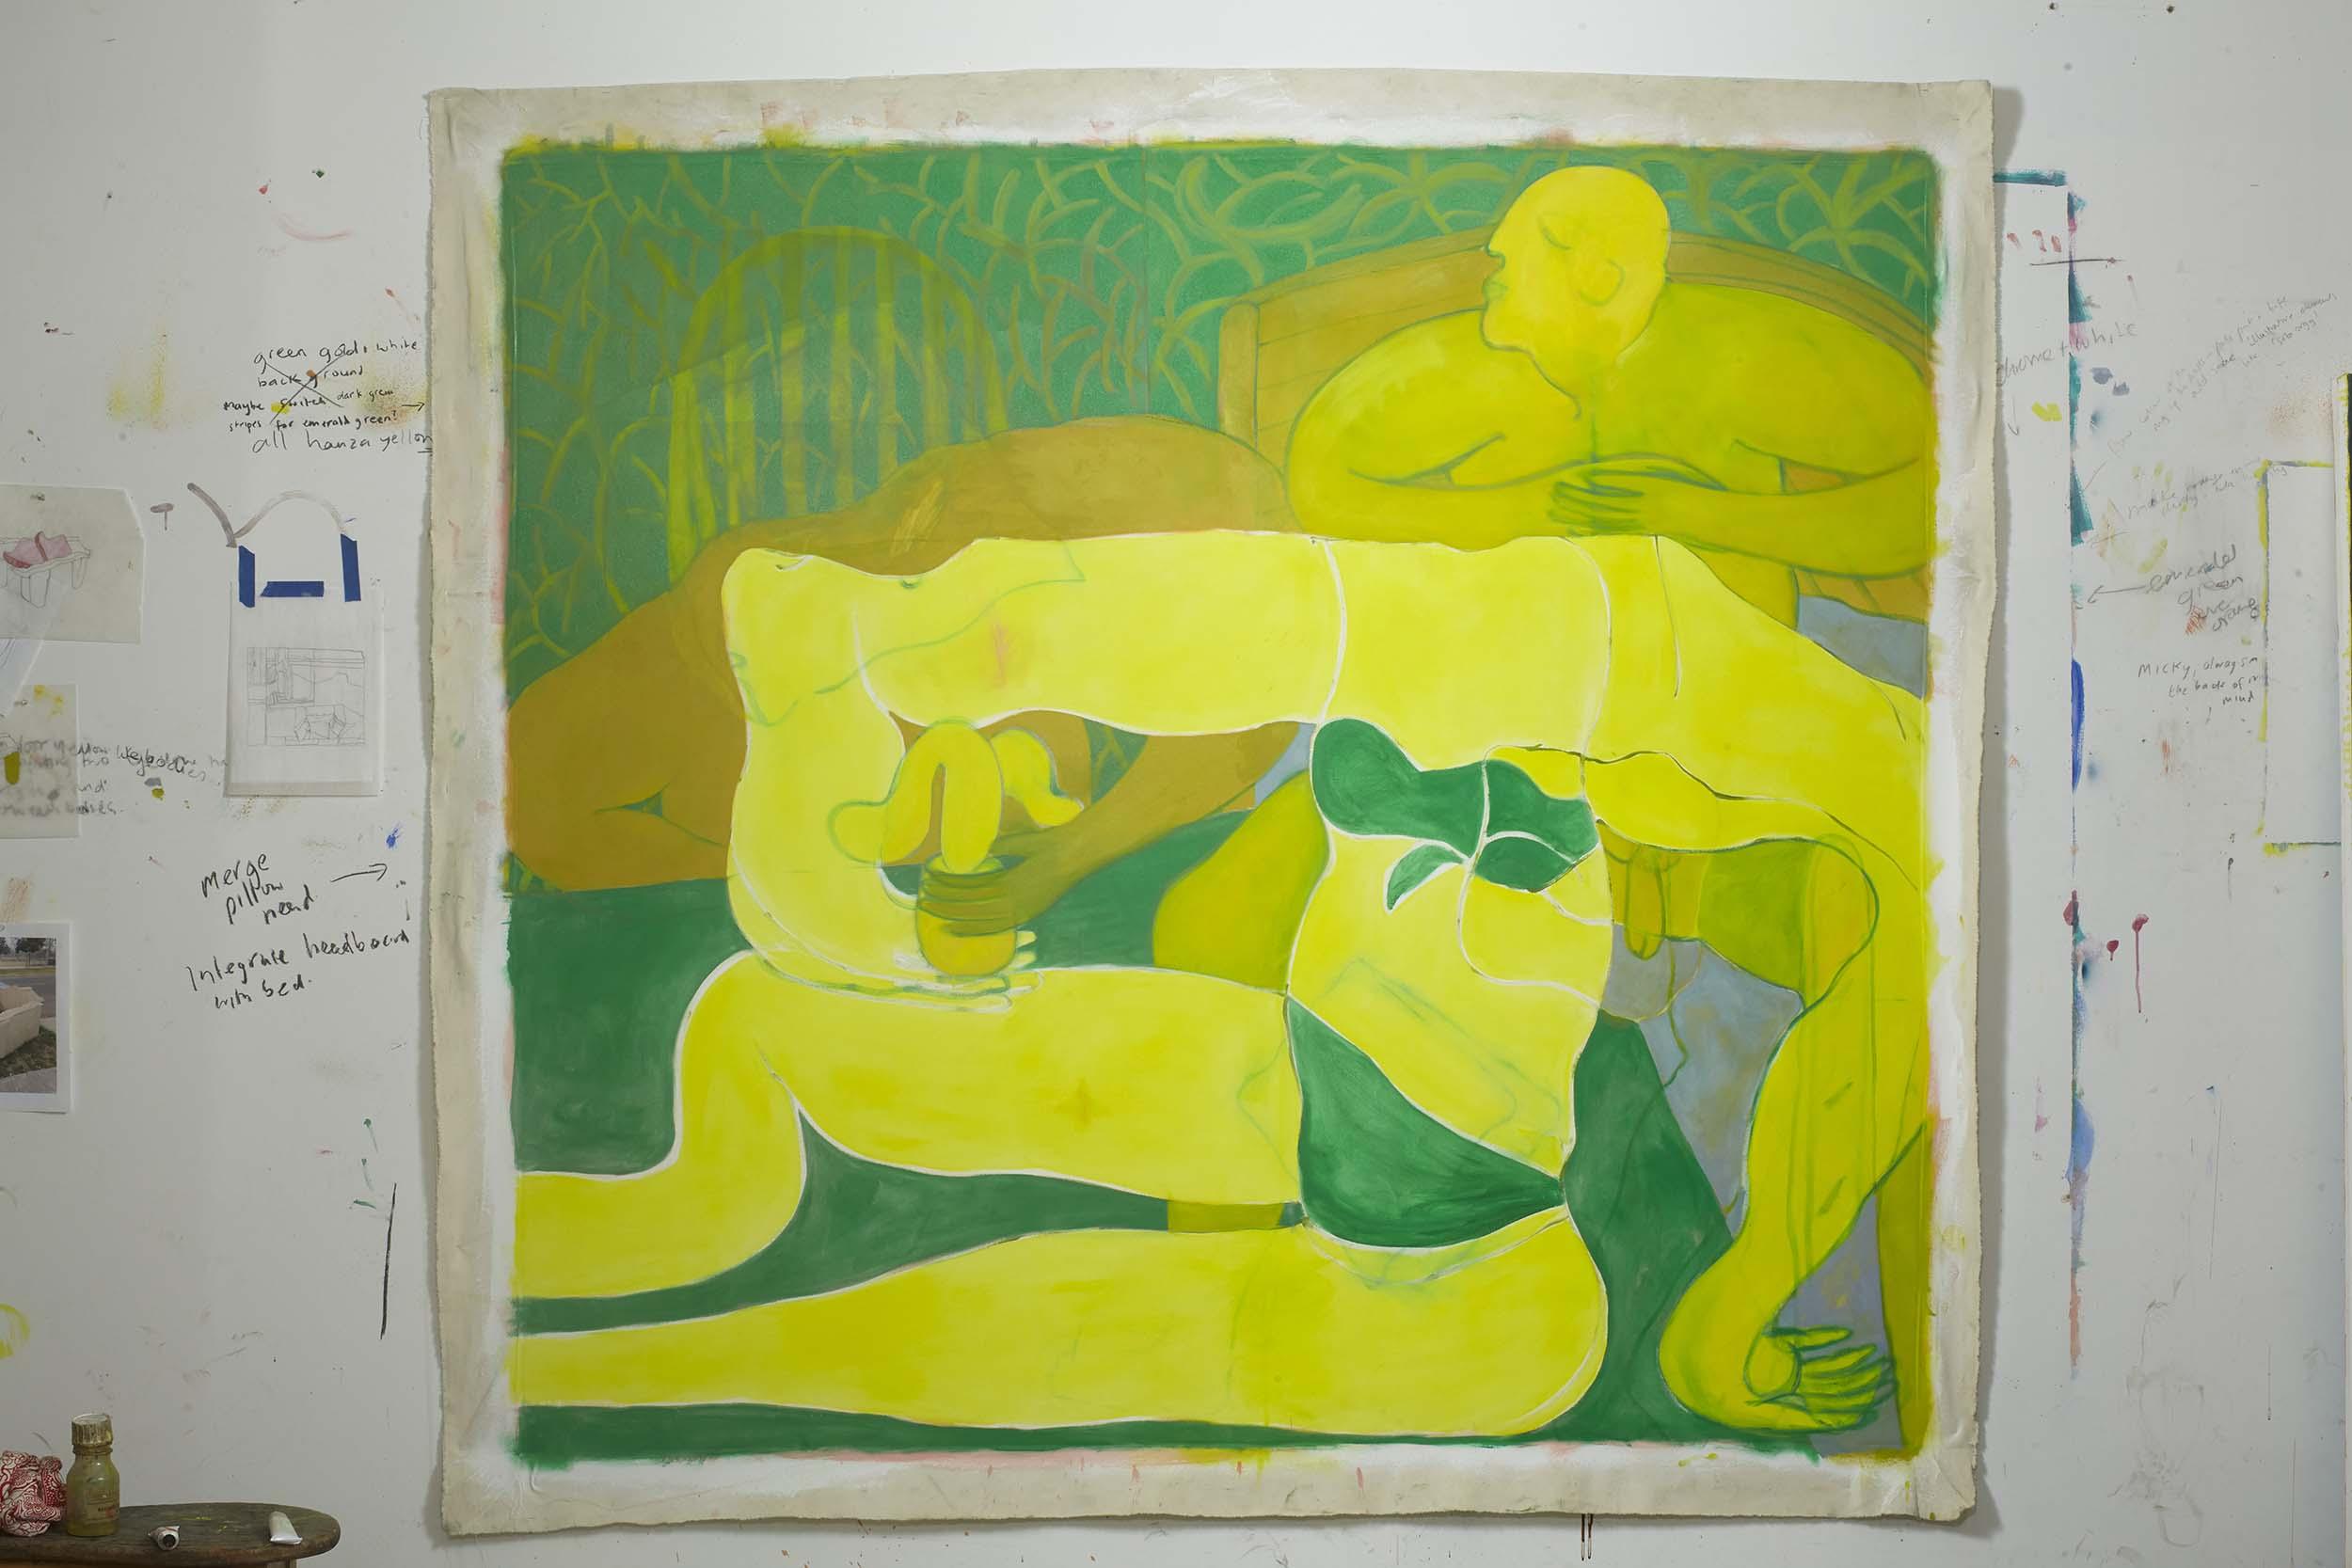 Tahnee Lonsdale, 'Posing Yellow Figure' - 83